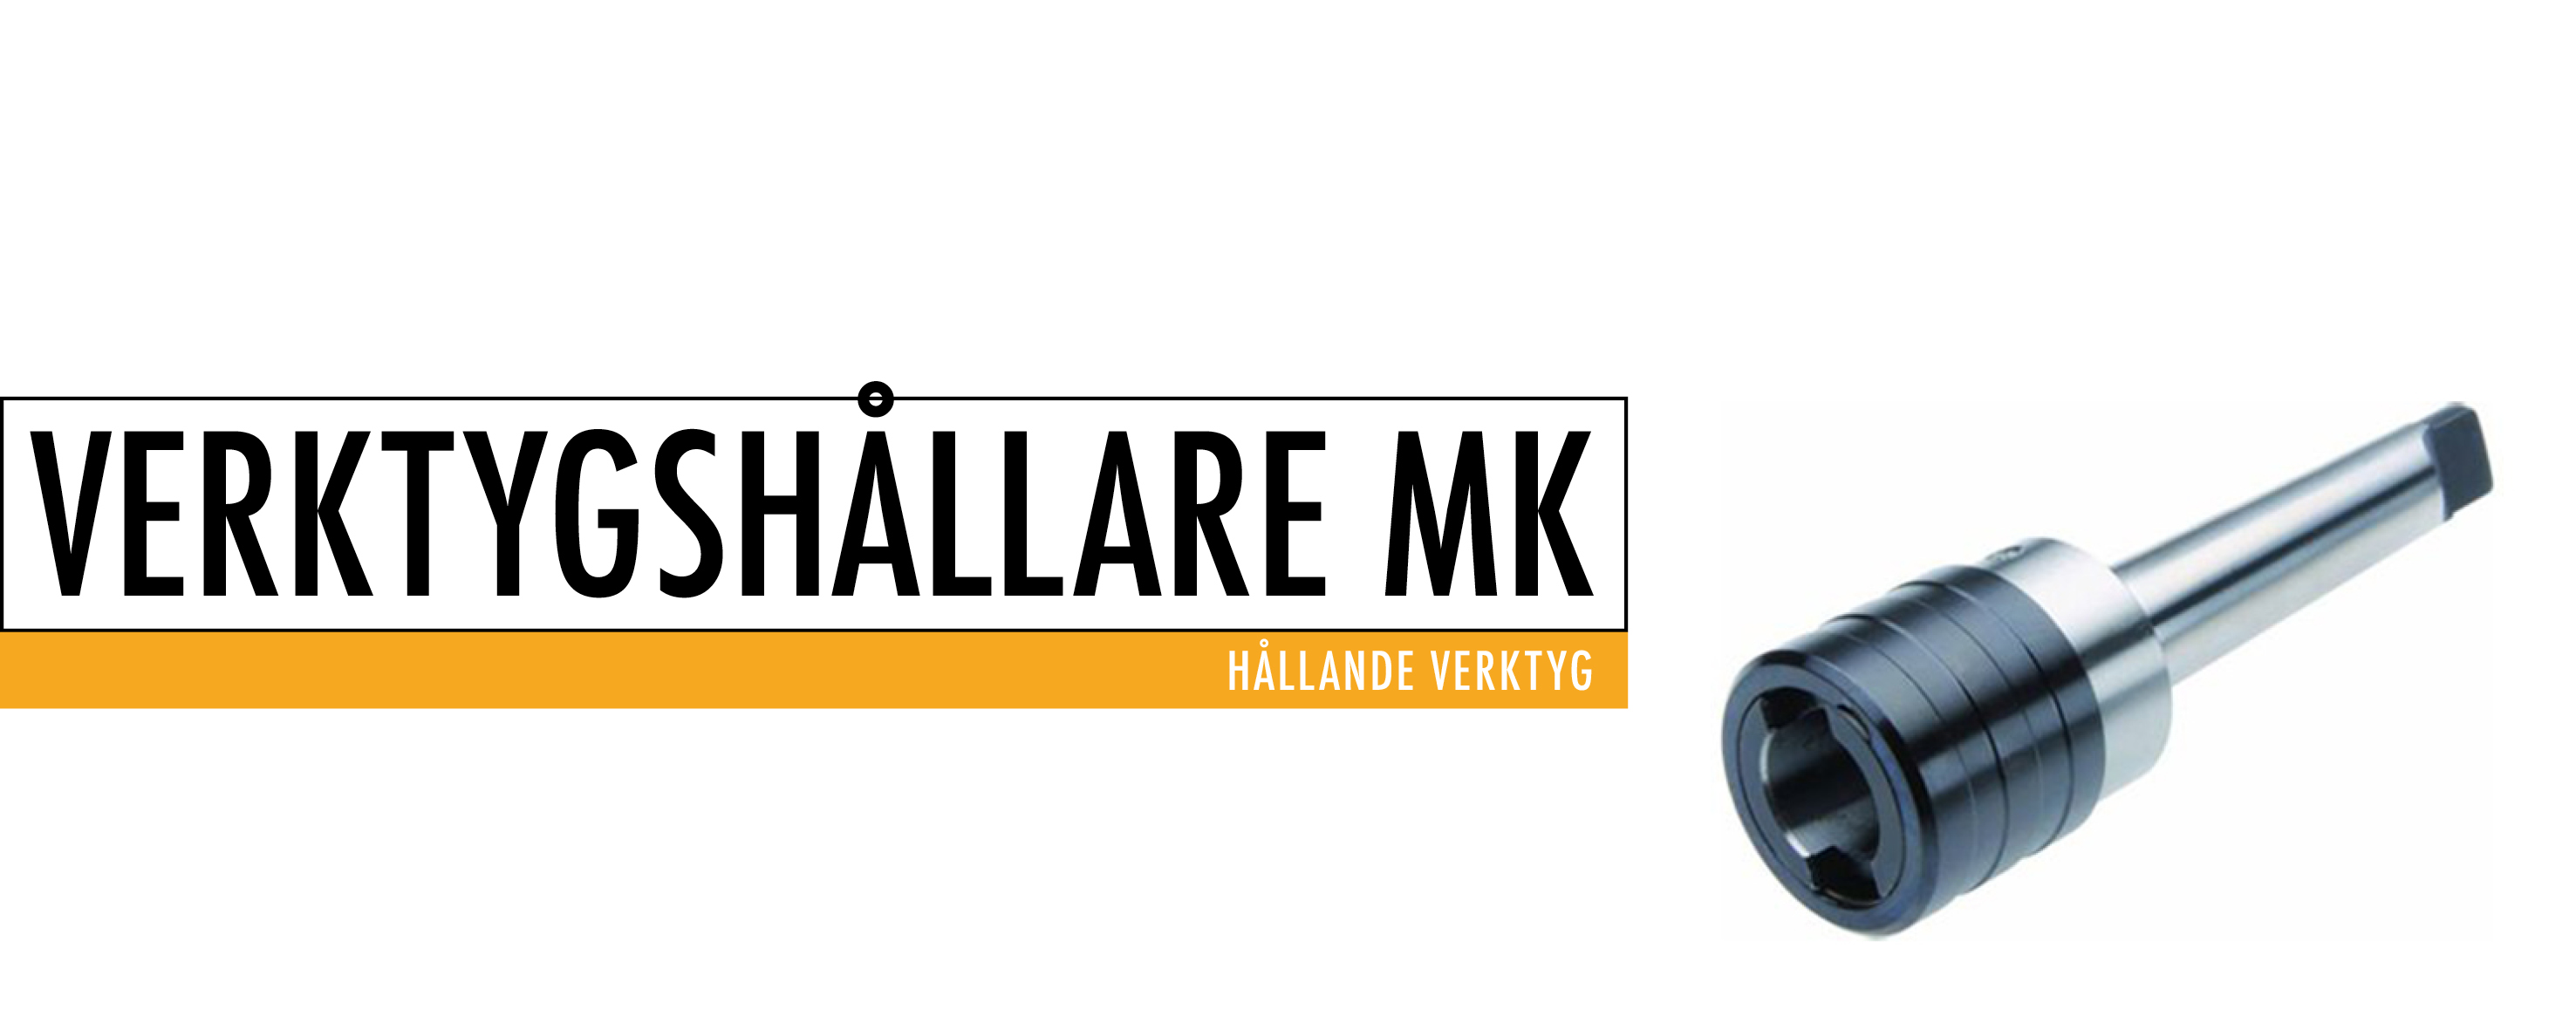 Verktygshållare MK